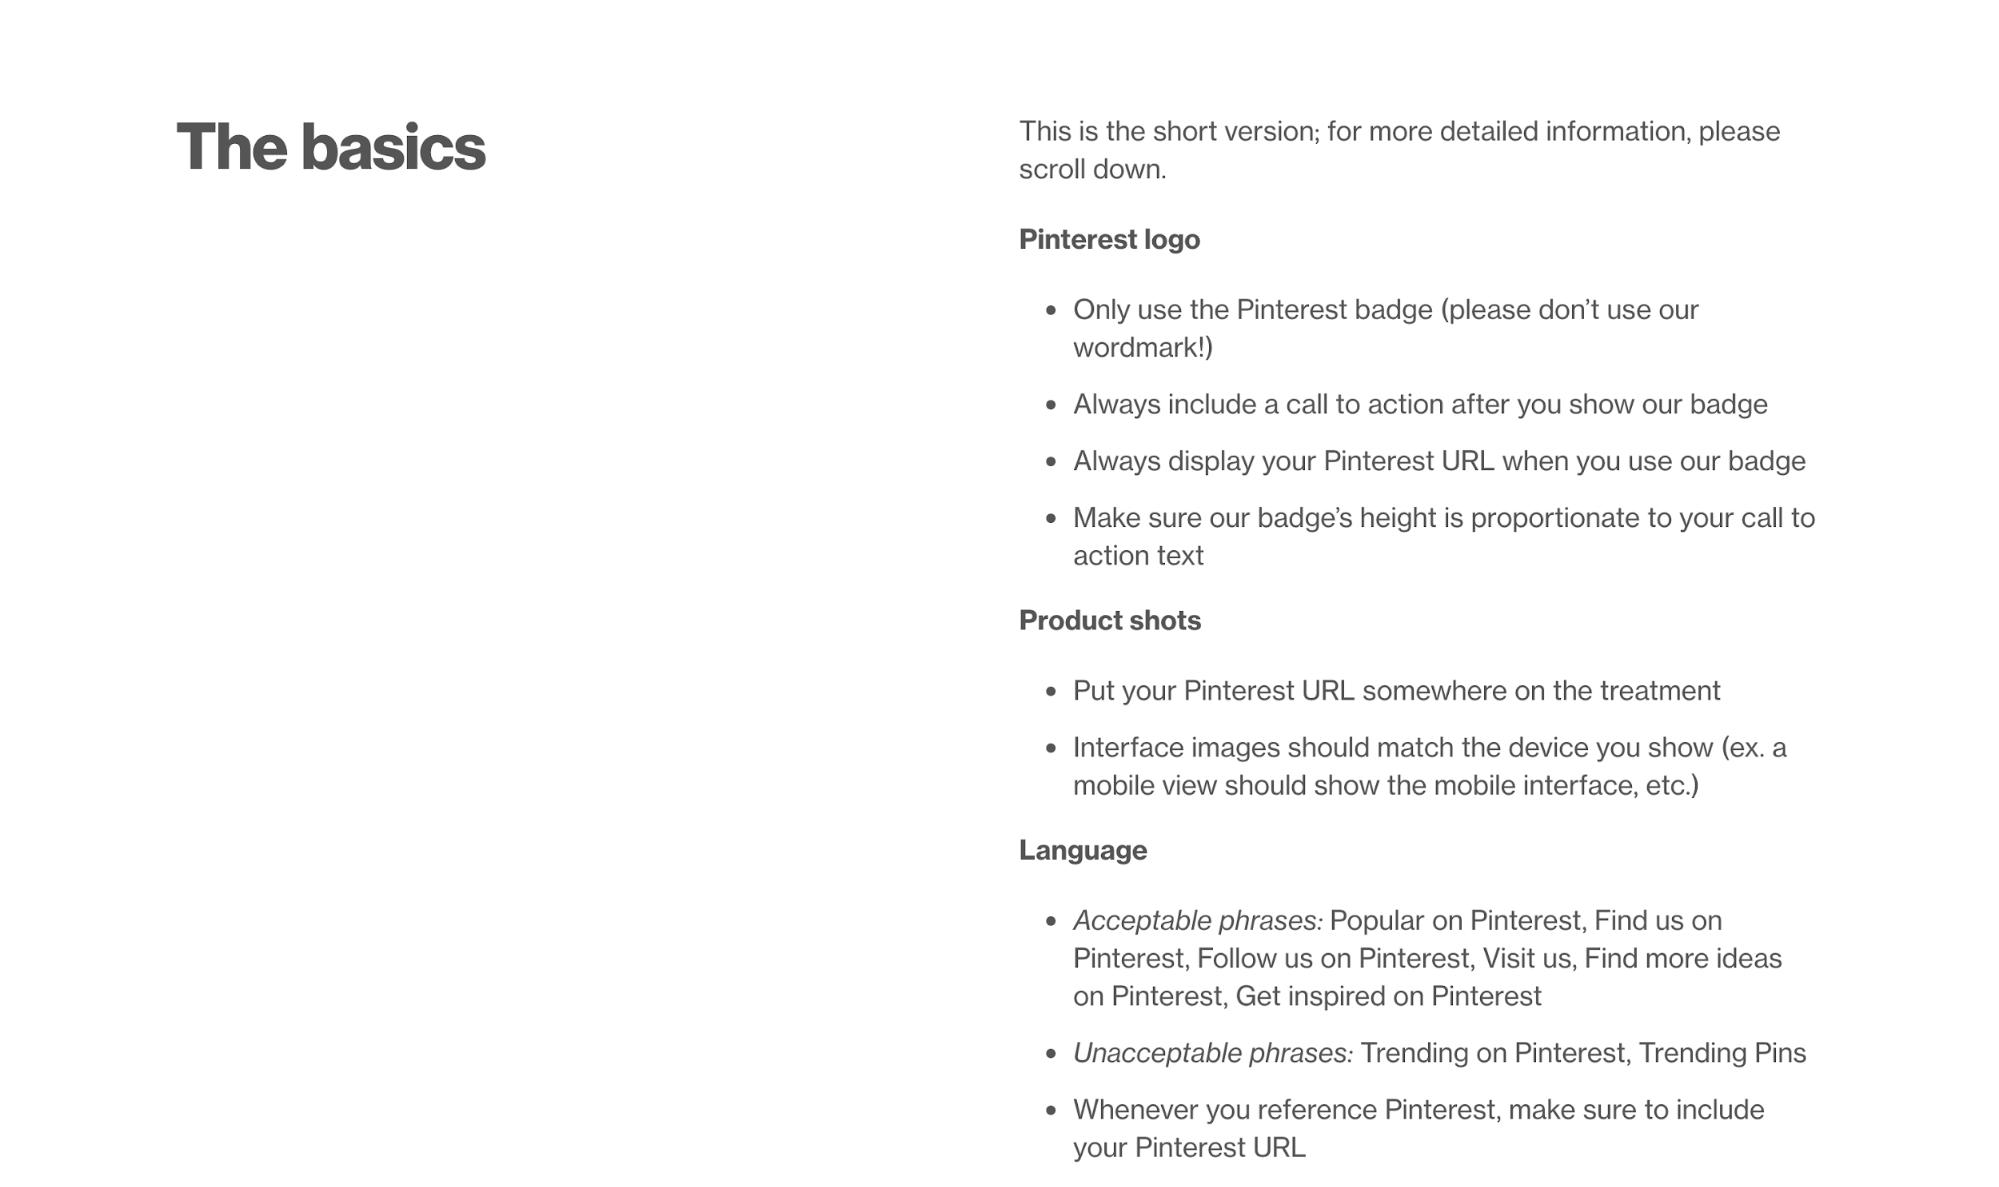 Pinterest Brand Guidelines Example